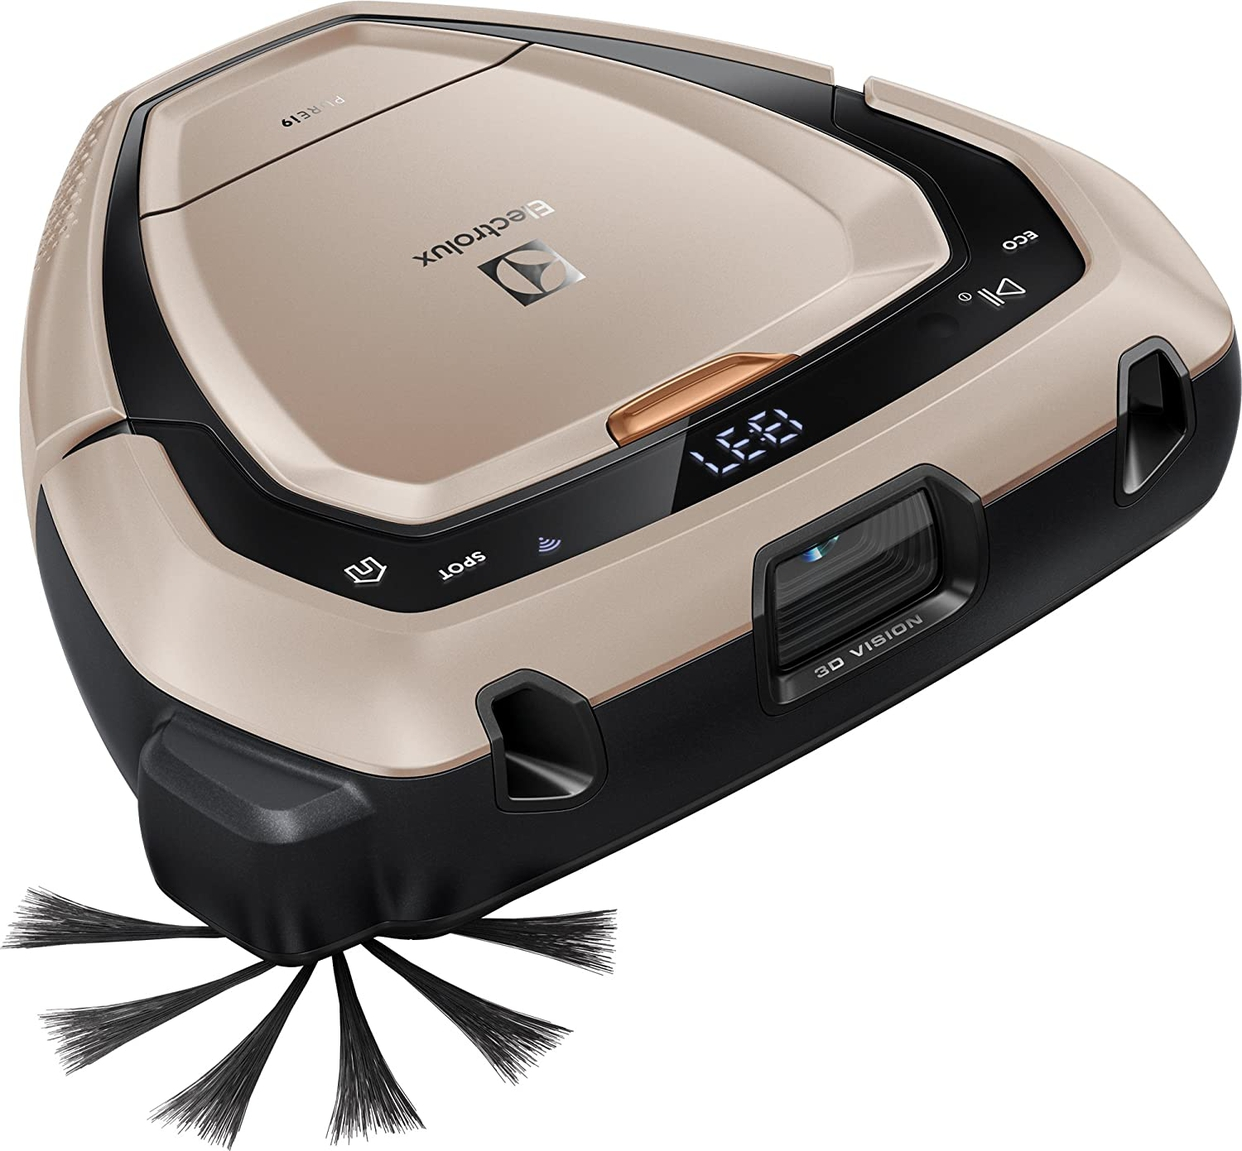 Electrolux(エレクトロラックス) PUREi9 PI91-5Sの商品画像